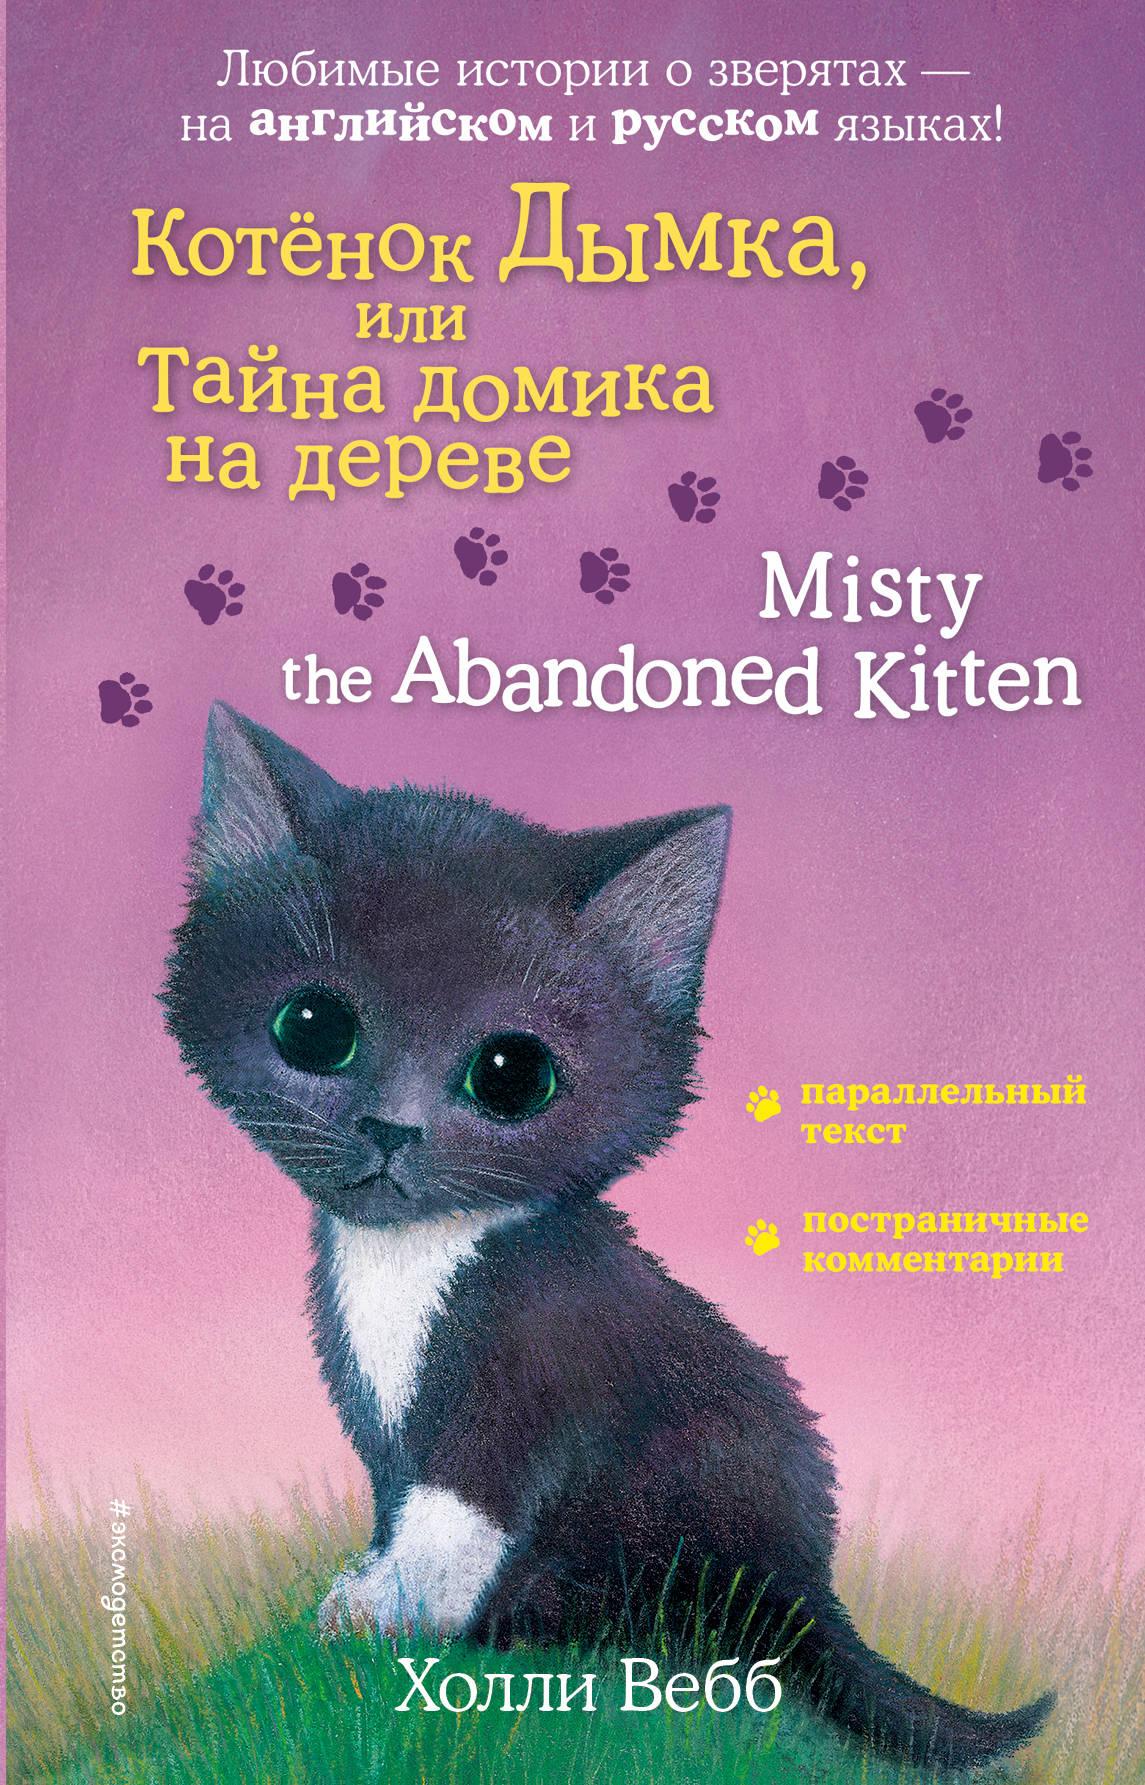 Котенок Дымка, или Тайна домика на дереве = Misty the Abandoned Kitten